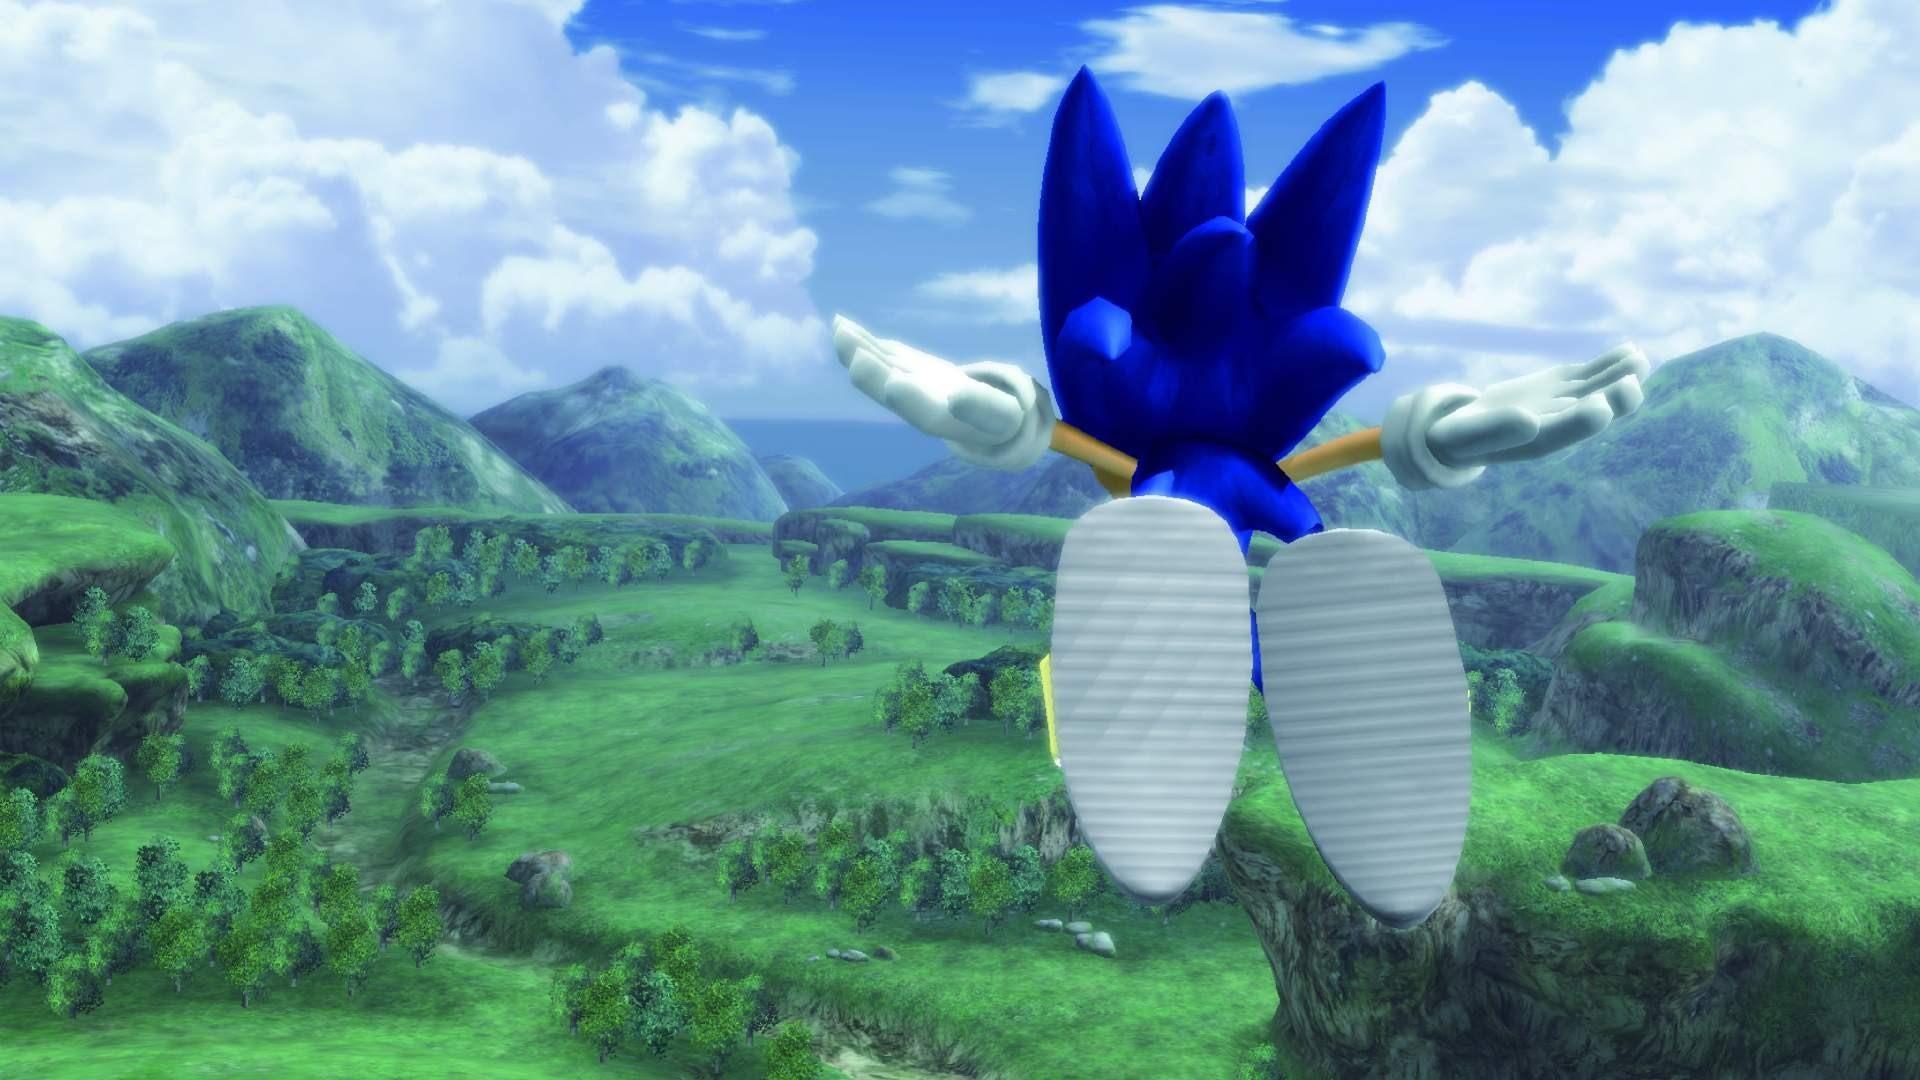 sonic the hedgehog 2006 1080p windows